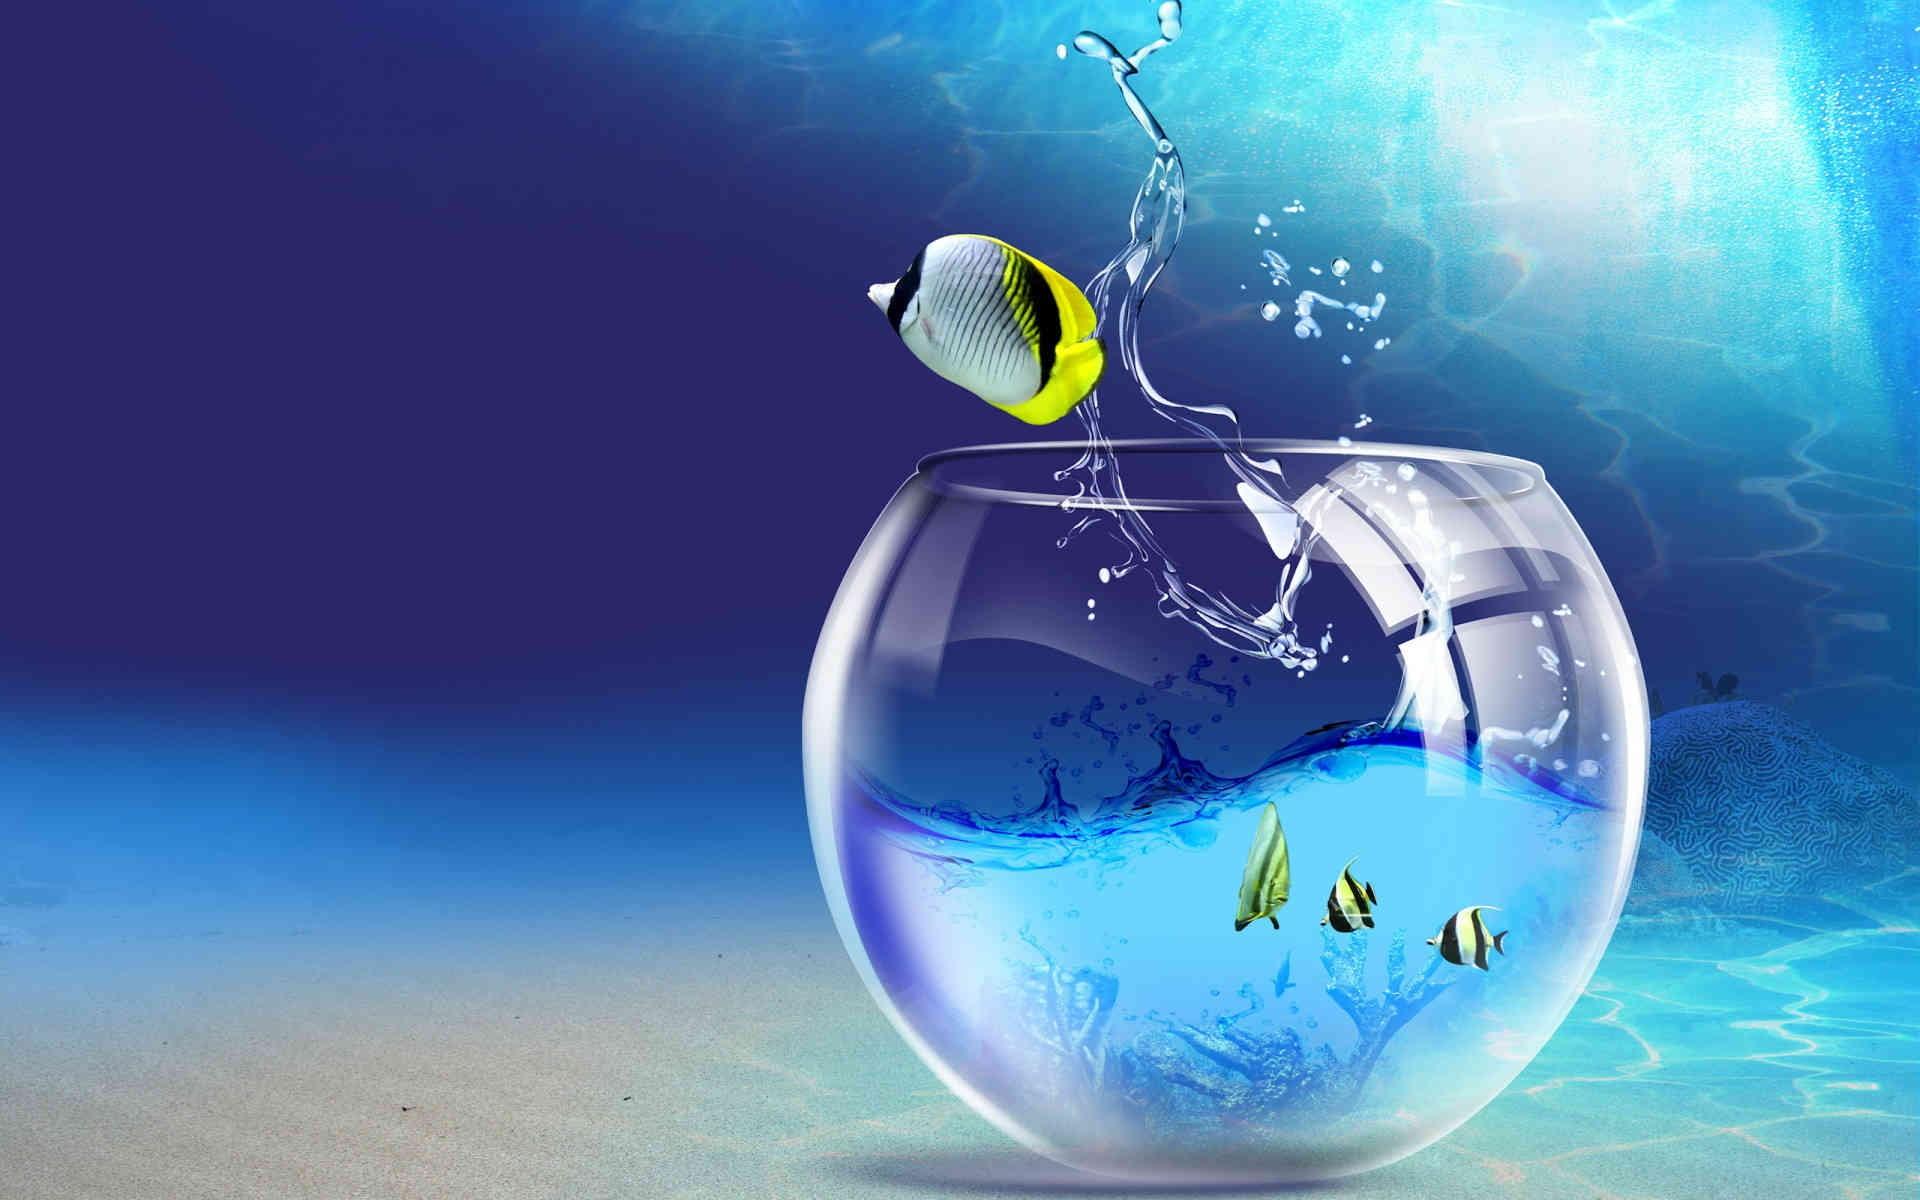 Beautiful-Fish-Free-Download-HD-Pop-wallpaper-wp3603111